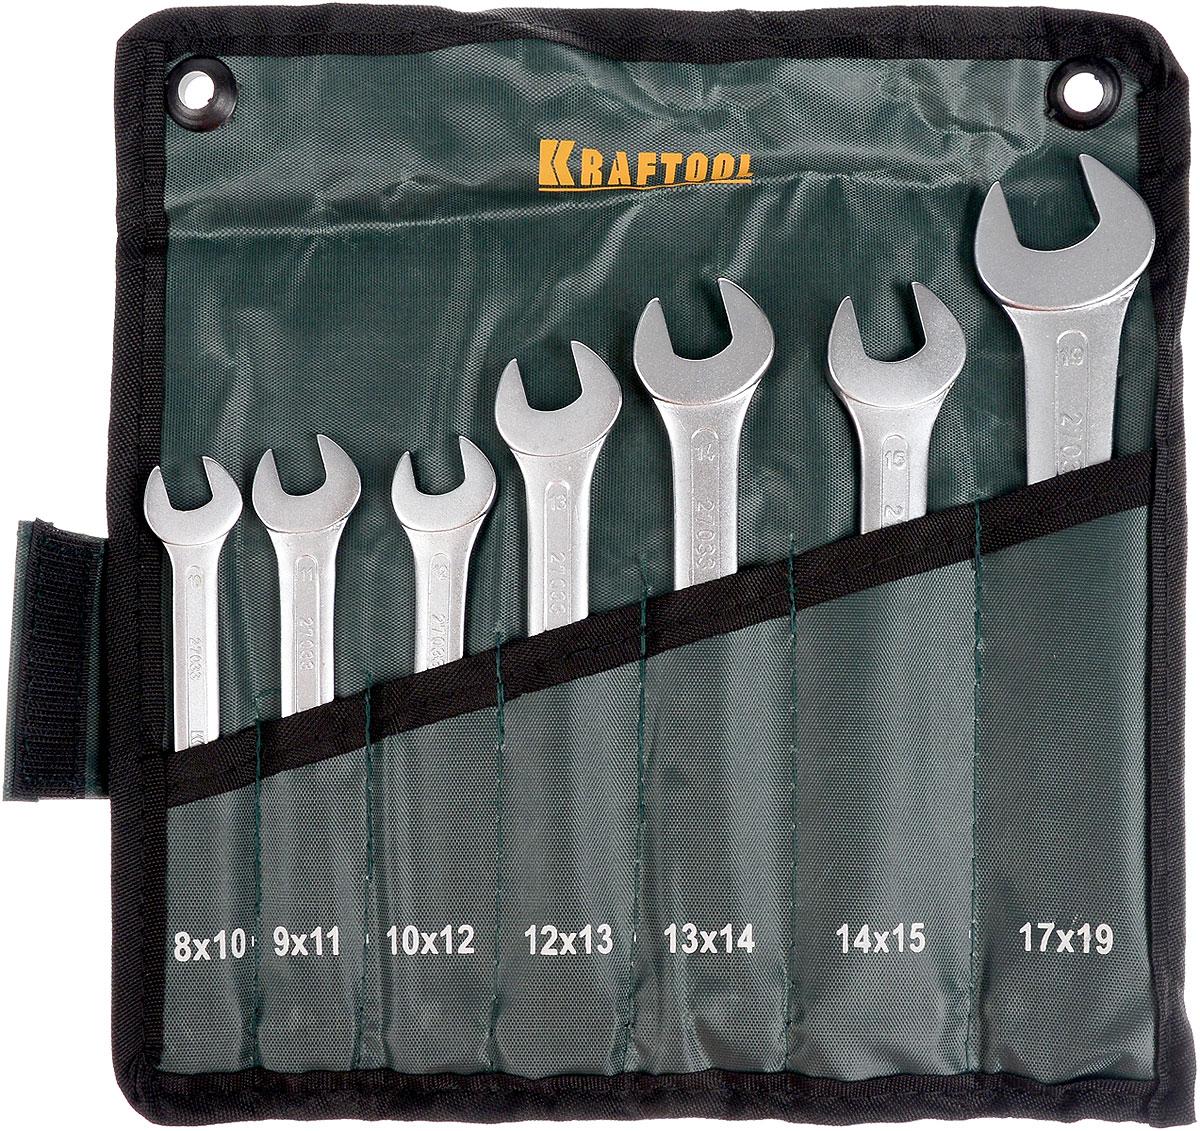 Набор рожковых гаечных ключей Kraftool Expert, 8-19 мм, 7 шт